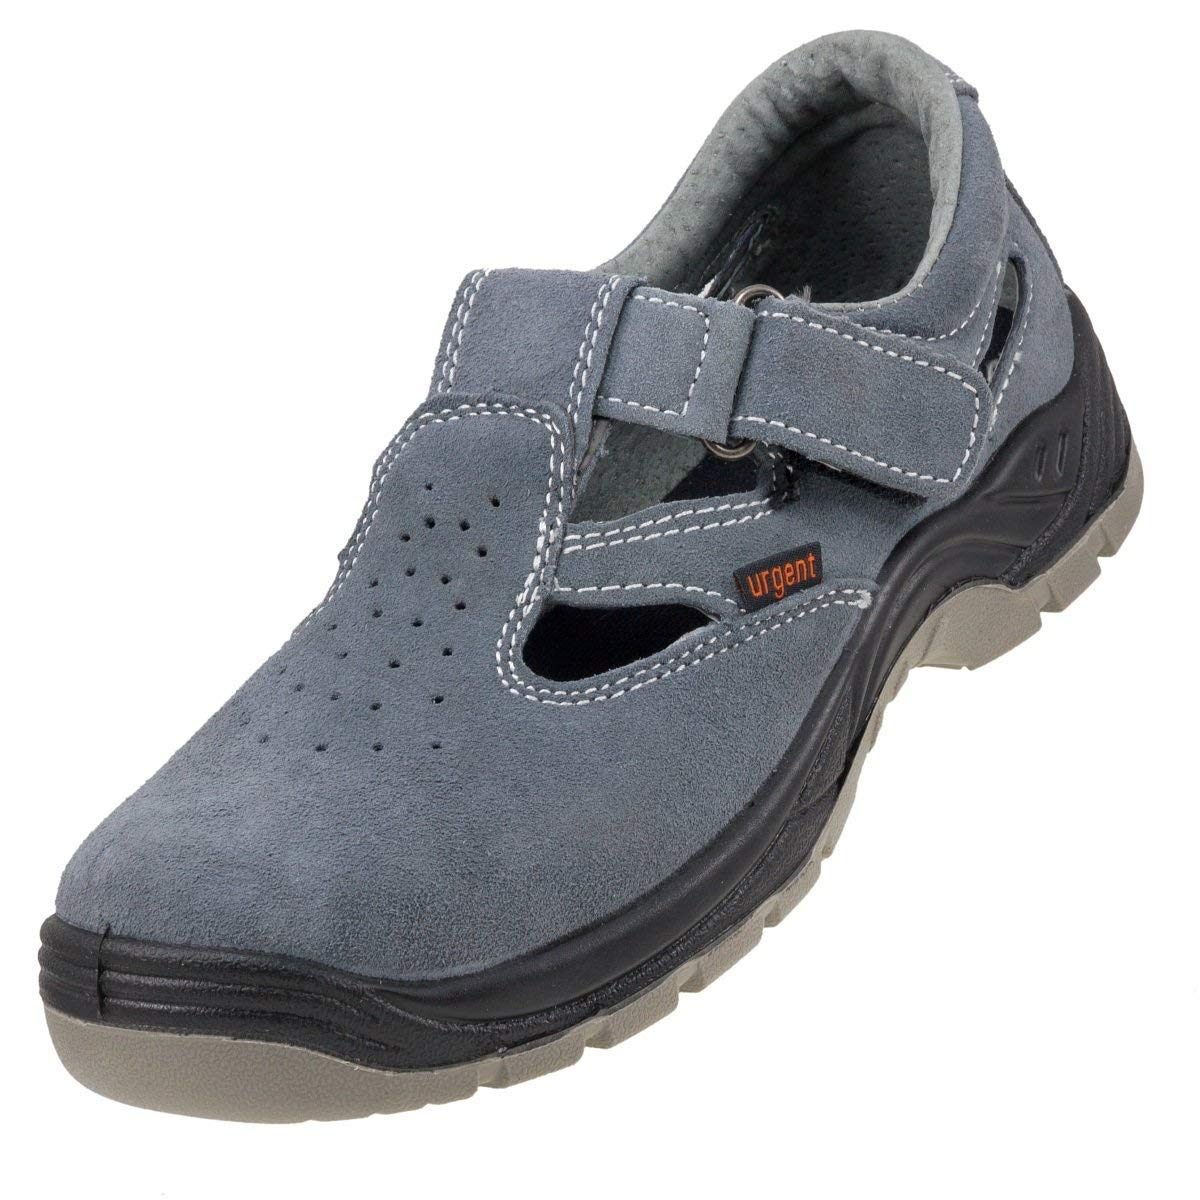 Lightweight Safety Sandals Grey Anti Static Slip Resistant Steel Toe Cap 302S1